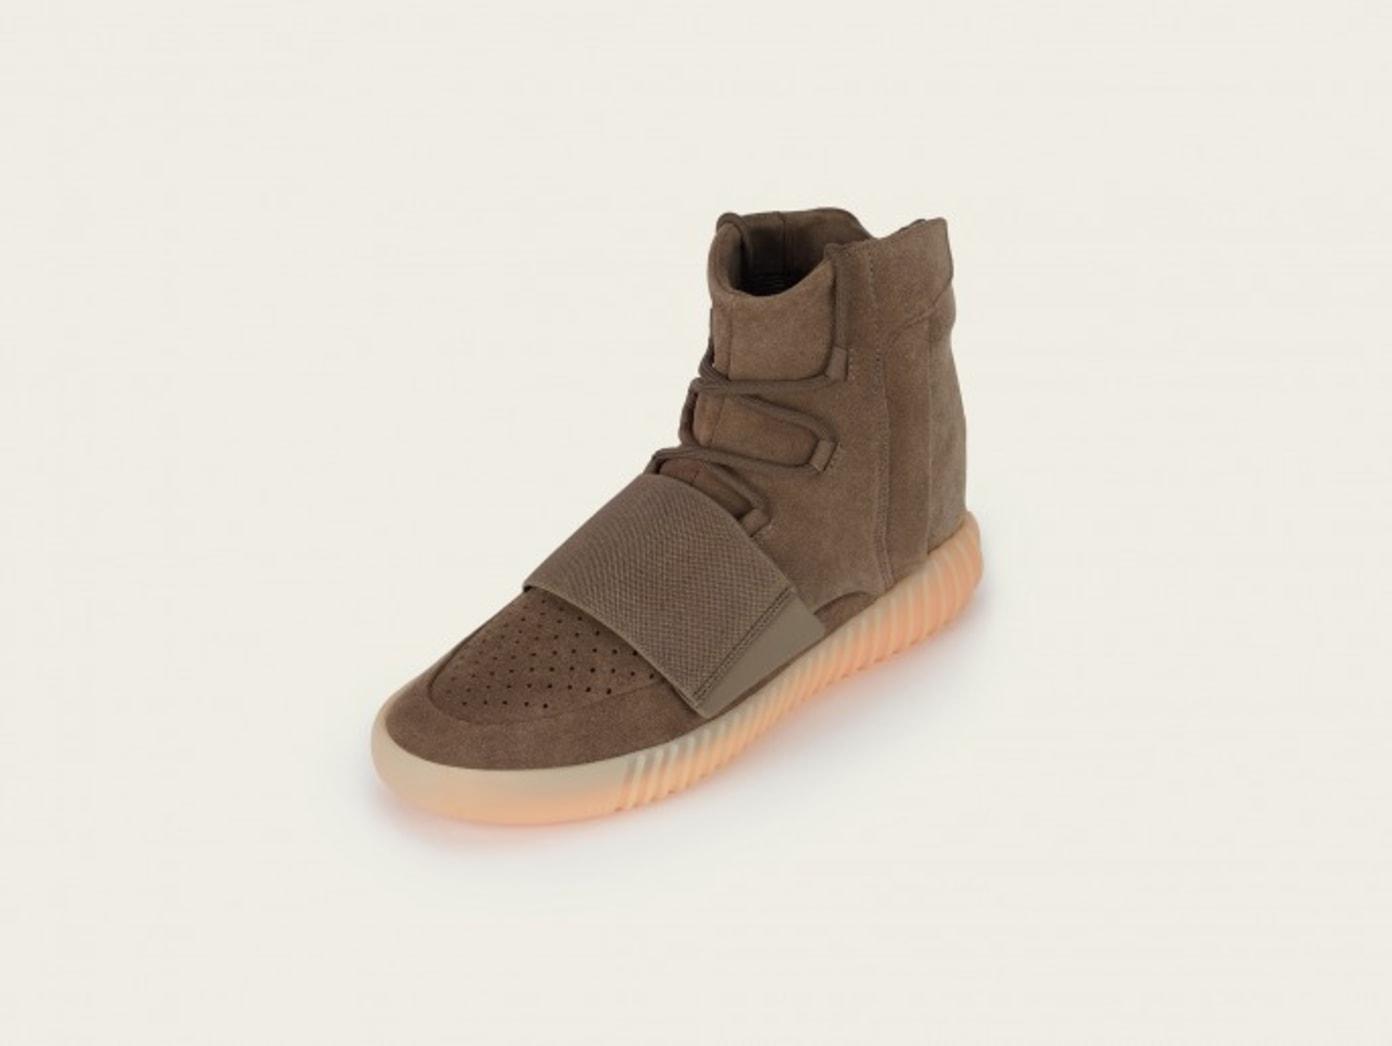 adidas x Kanye West YEEZY BOOST 750 Light Brown